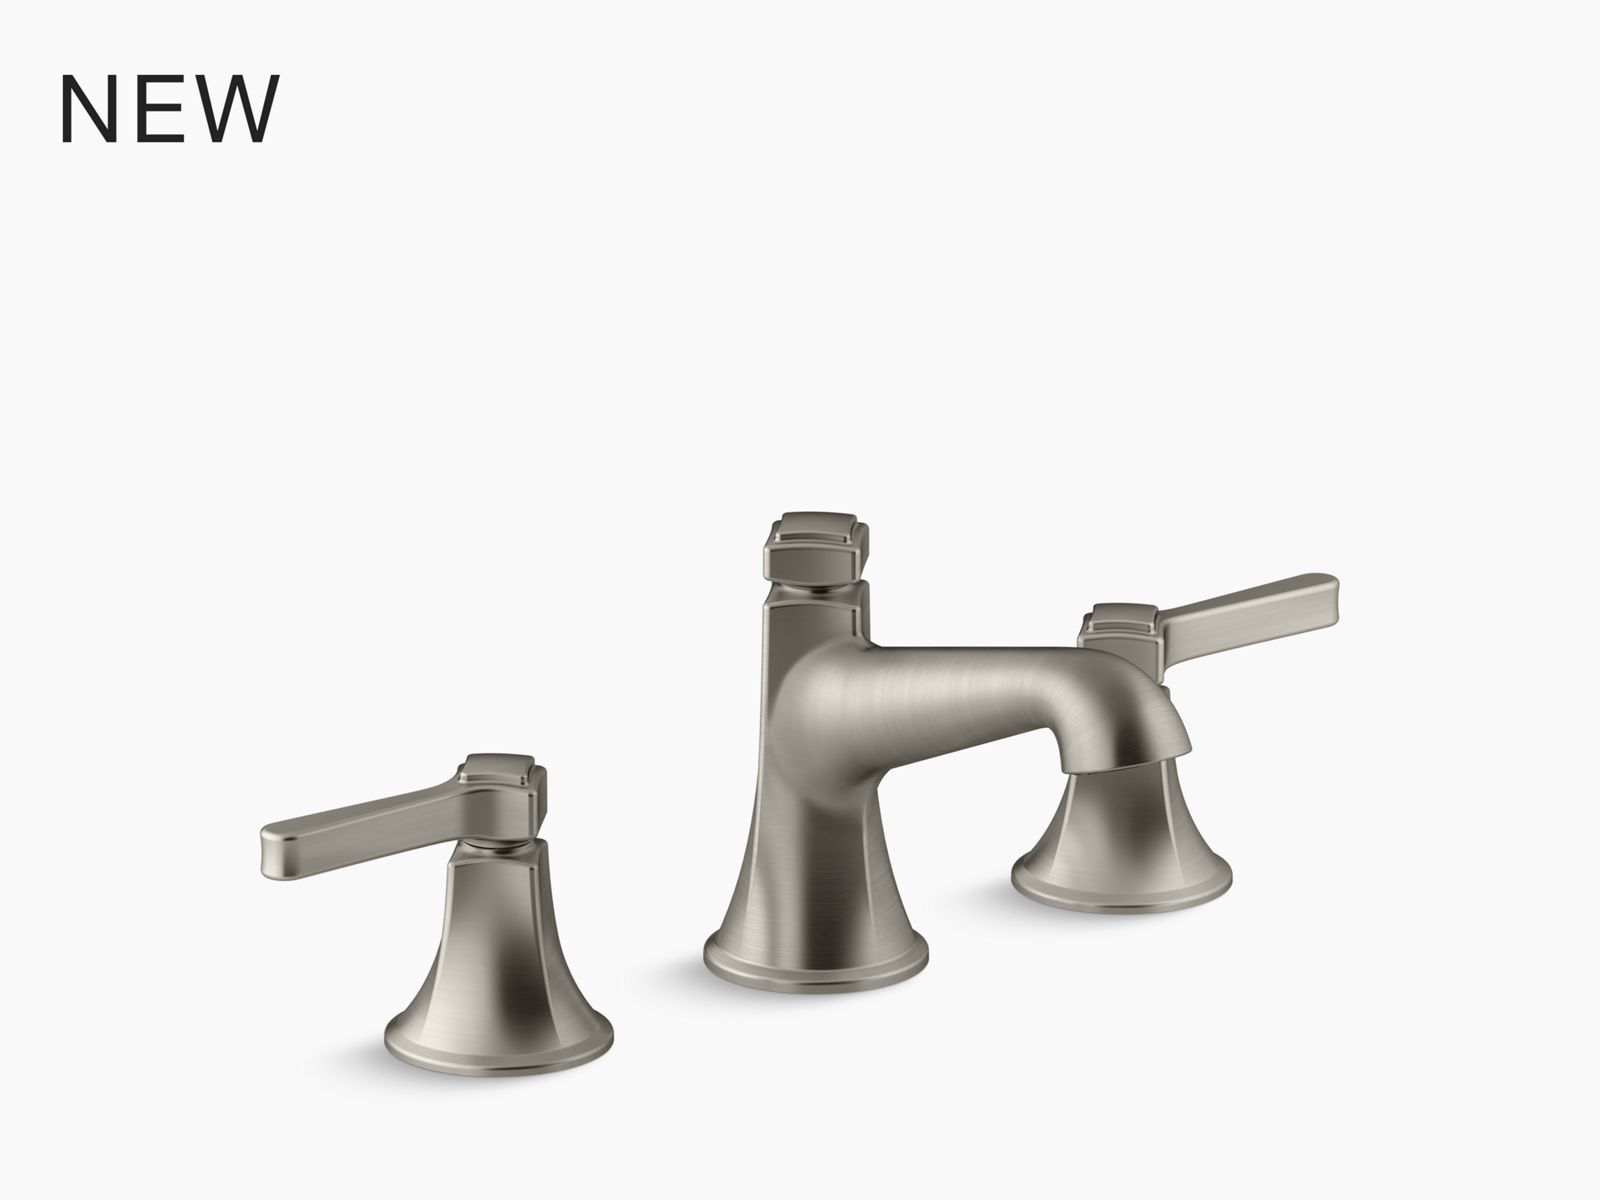 graze graze pull down kitchen sink faucet with three function sprayhead